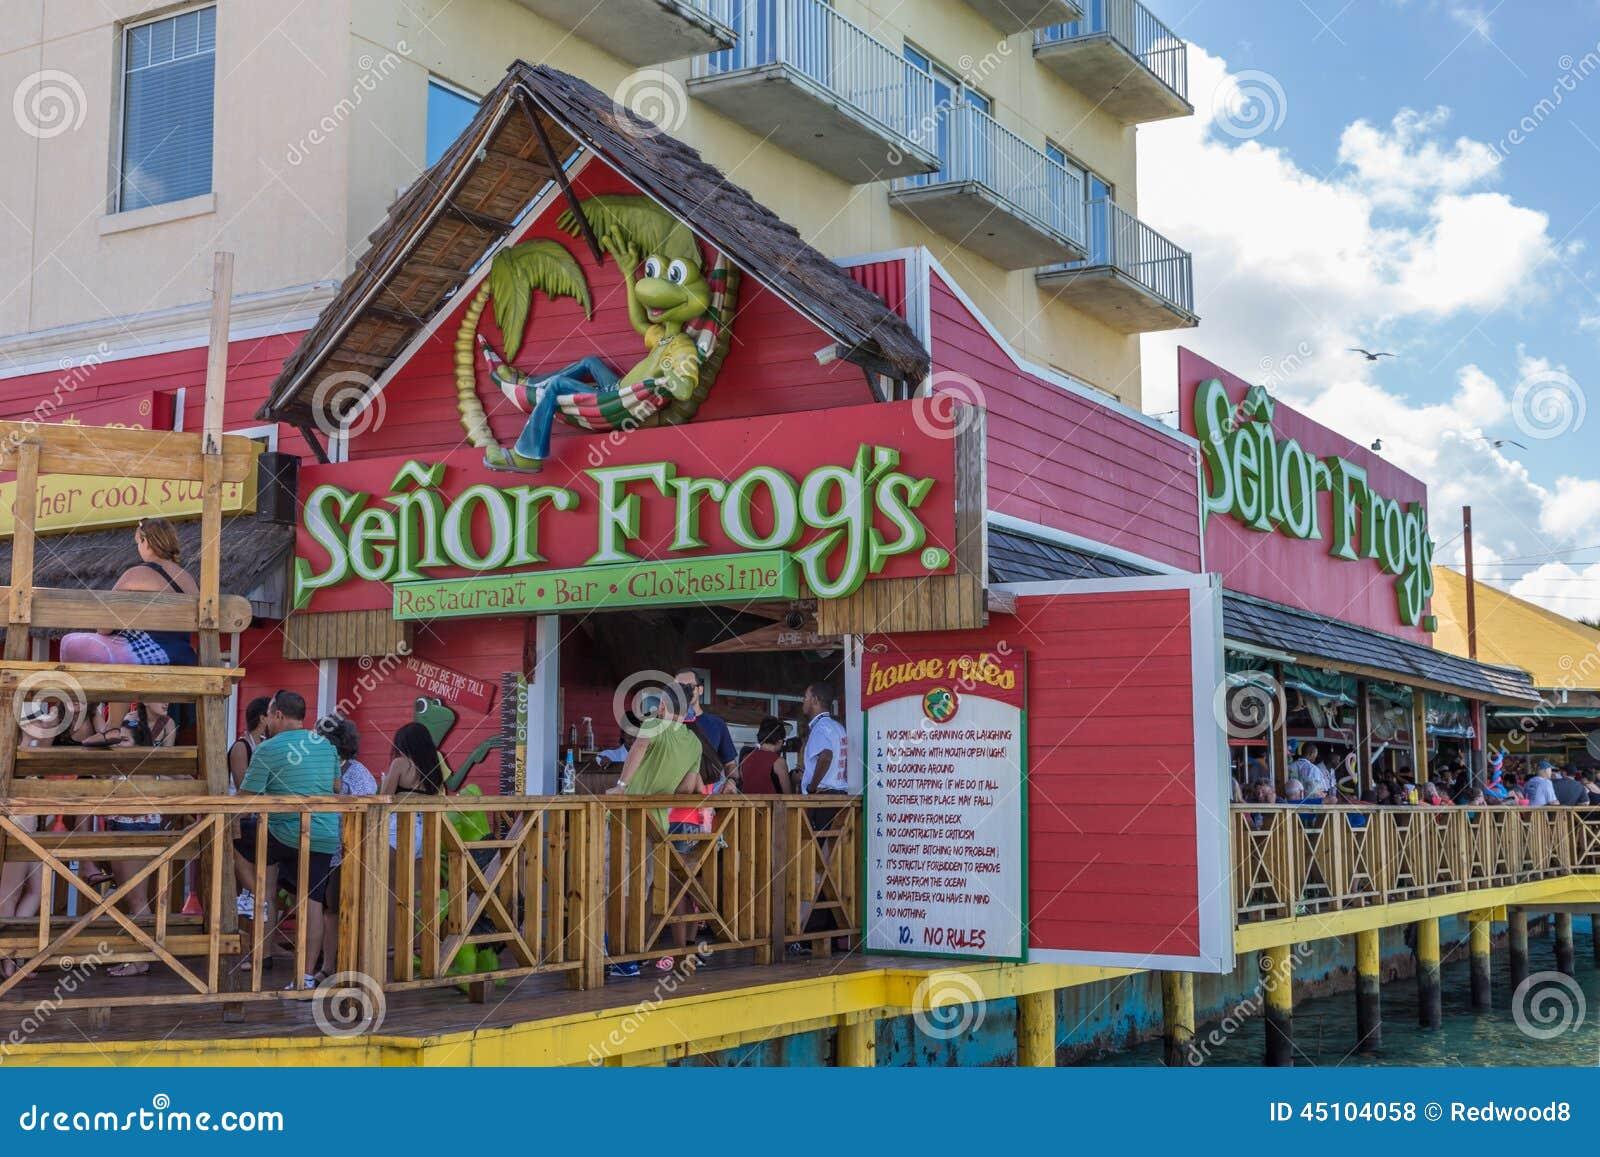 Best Restaurant Grand Island